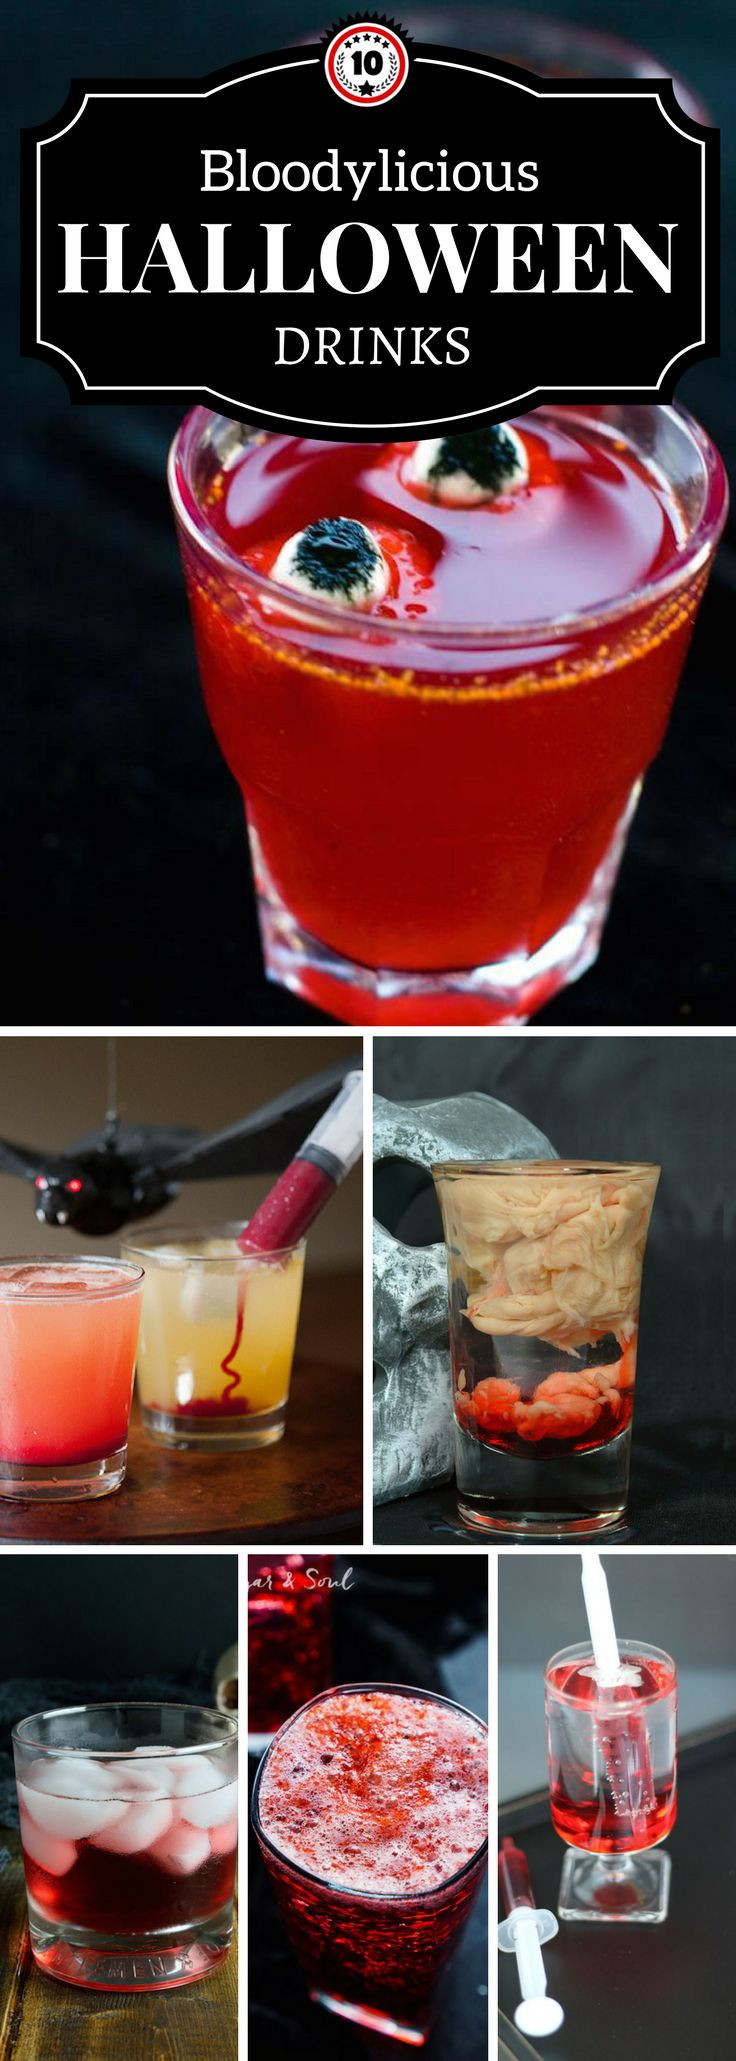 Halloween Alcohol Drinks  Best 25 Halloween drinks ideas on Pinterest